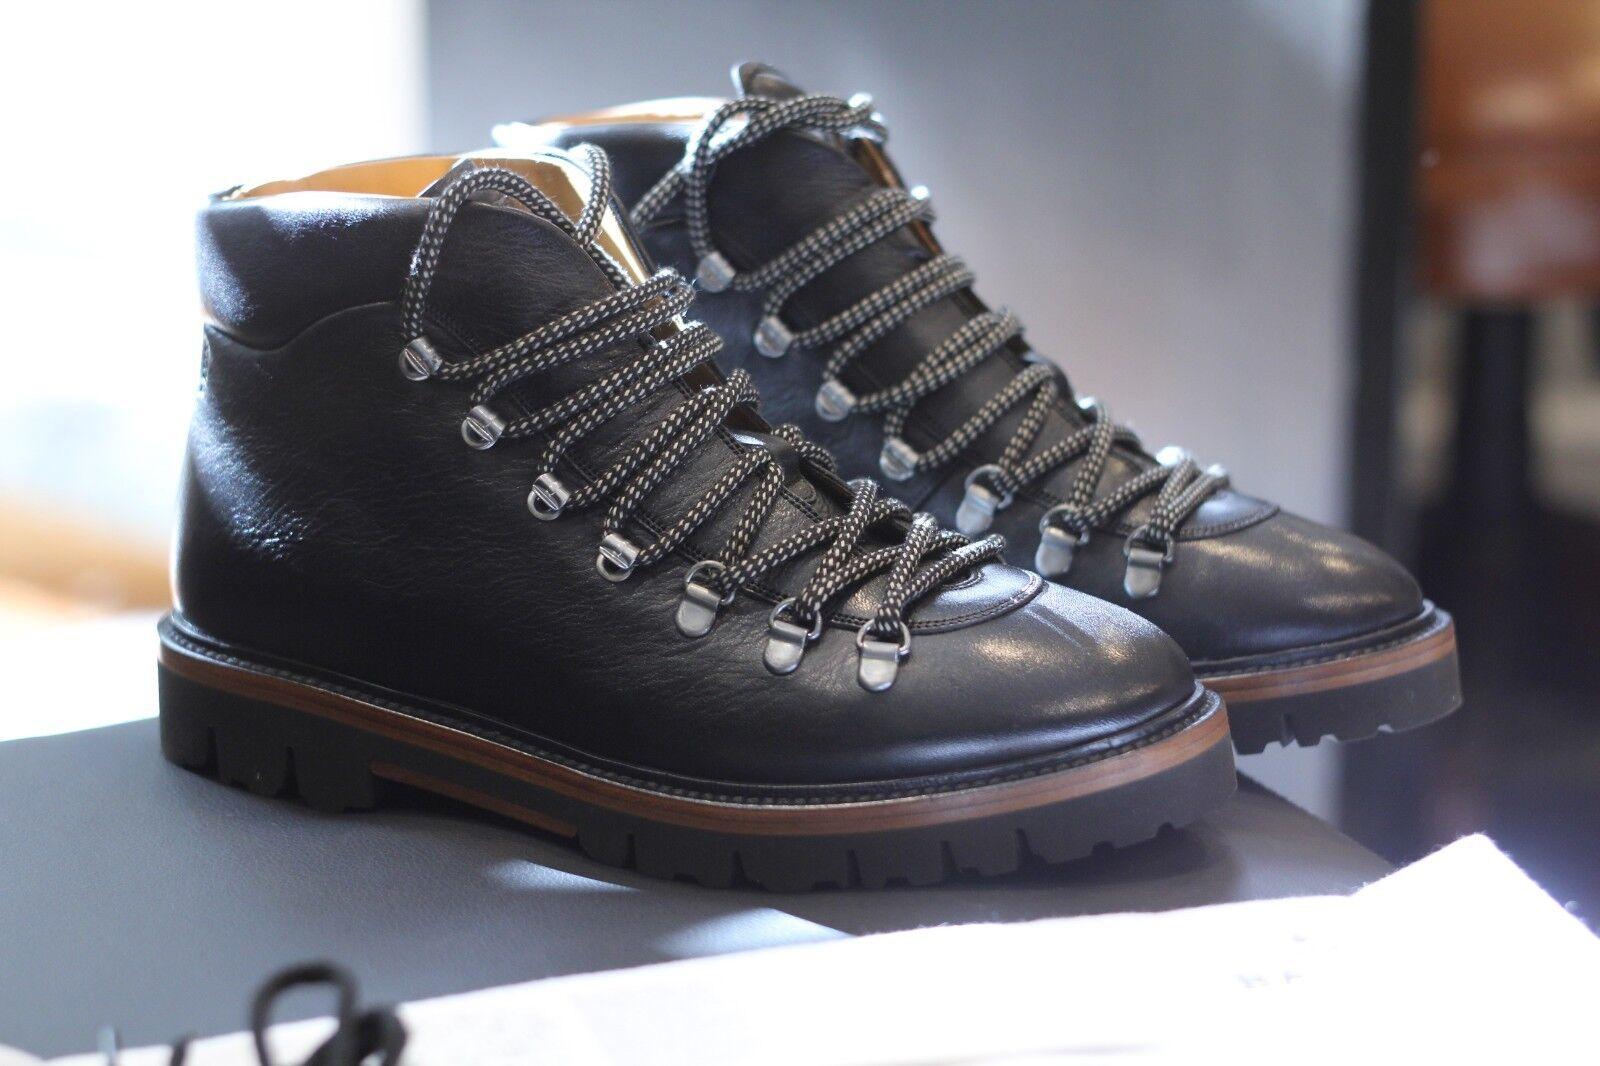 Bally Graf negro de piel de becerro Senderismo botas De Nieve Swiss Raro Descatalogado D